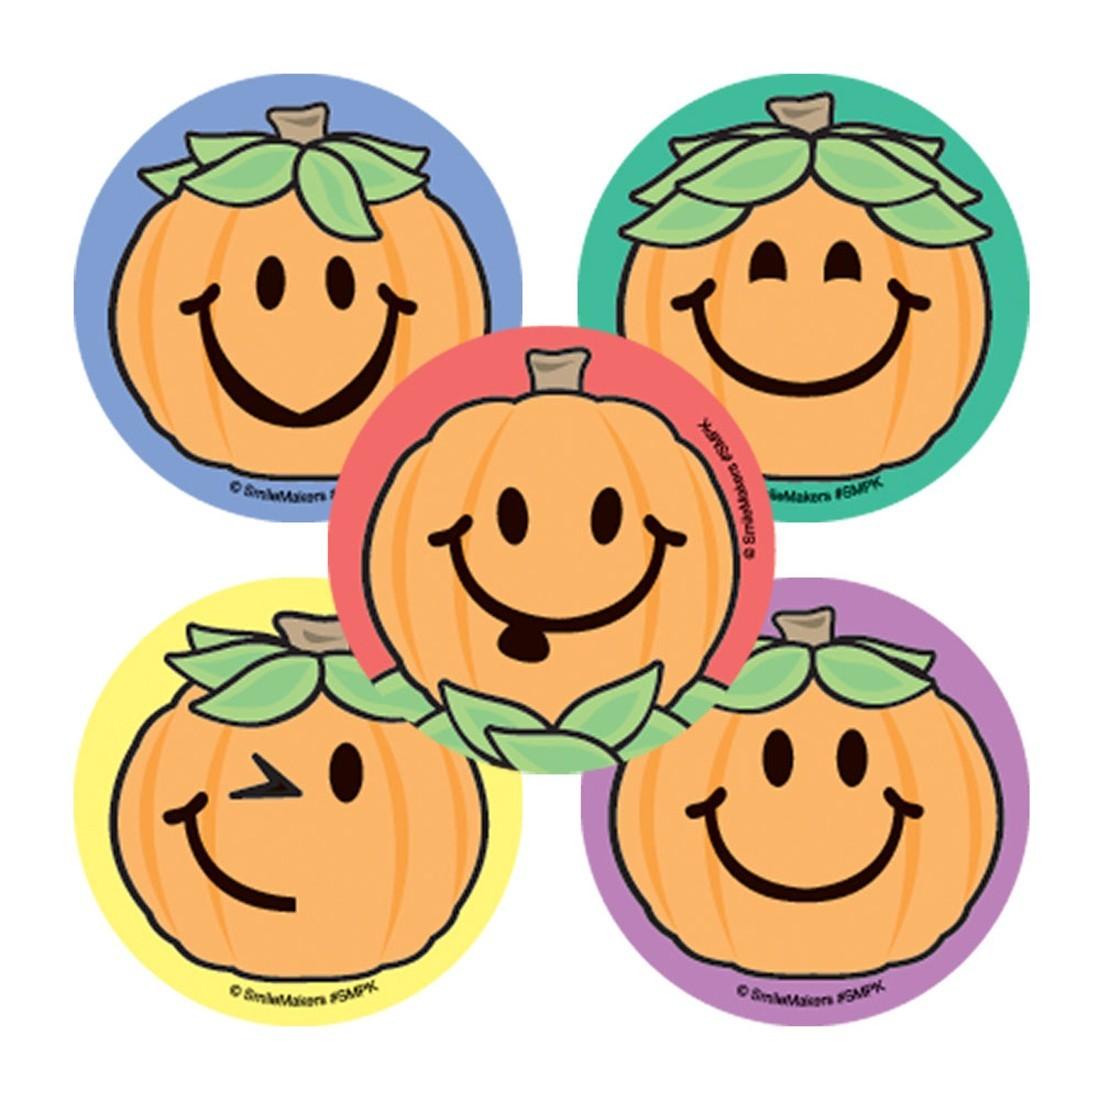 Smiley Guy Jack O Lantern Stickers                 [image]